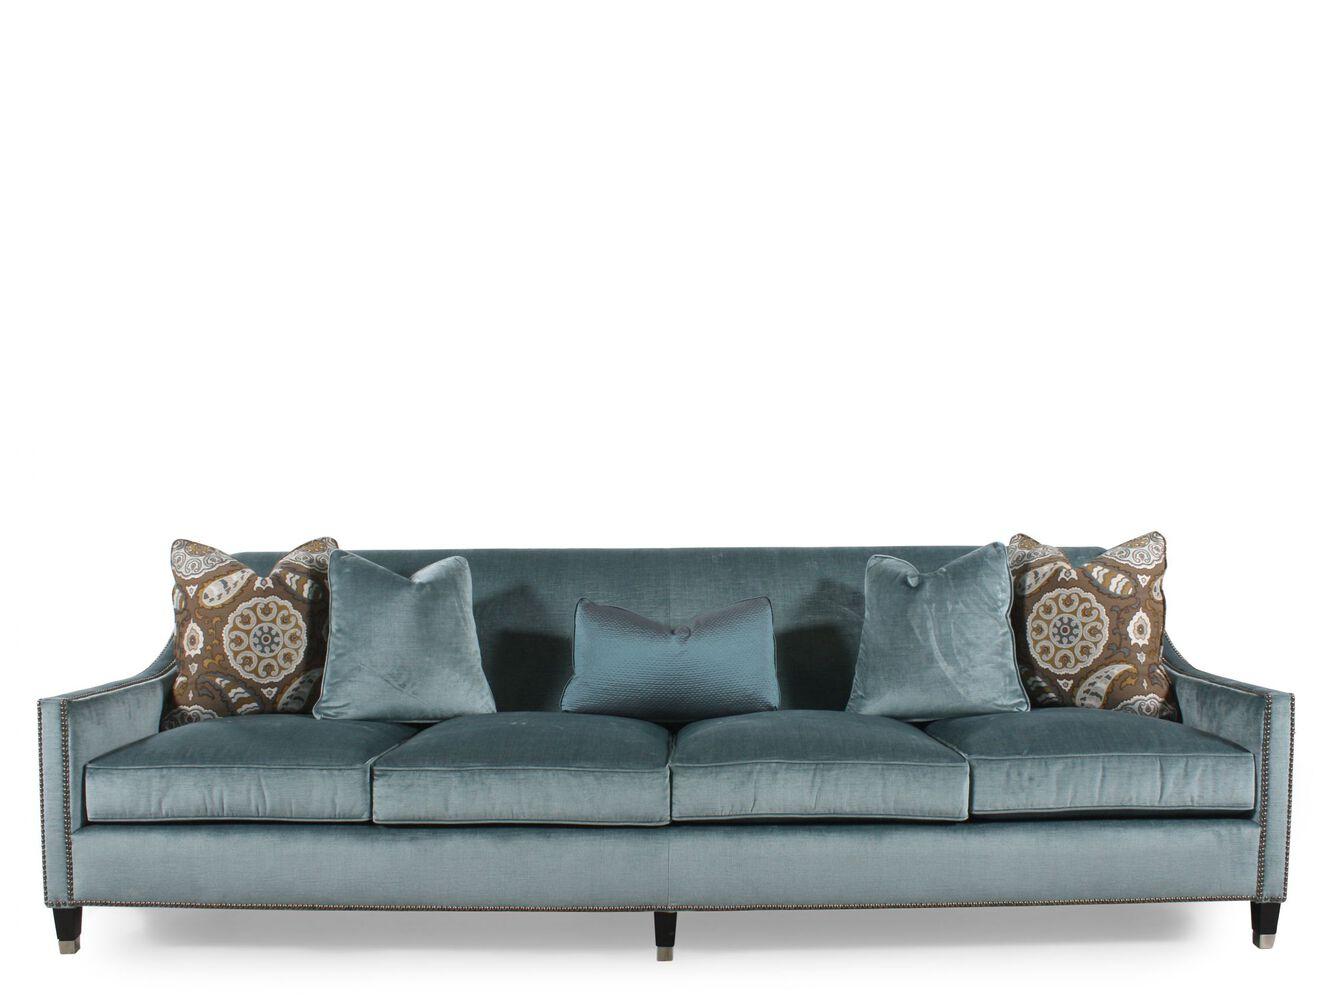 Bernhardt Leather Sofa Price